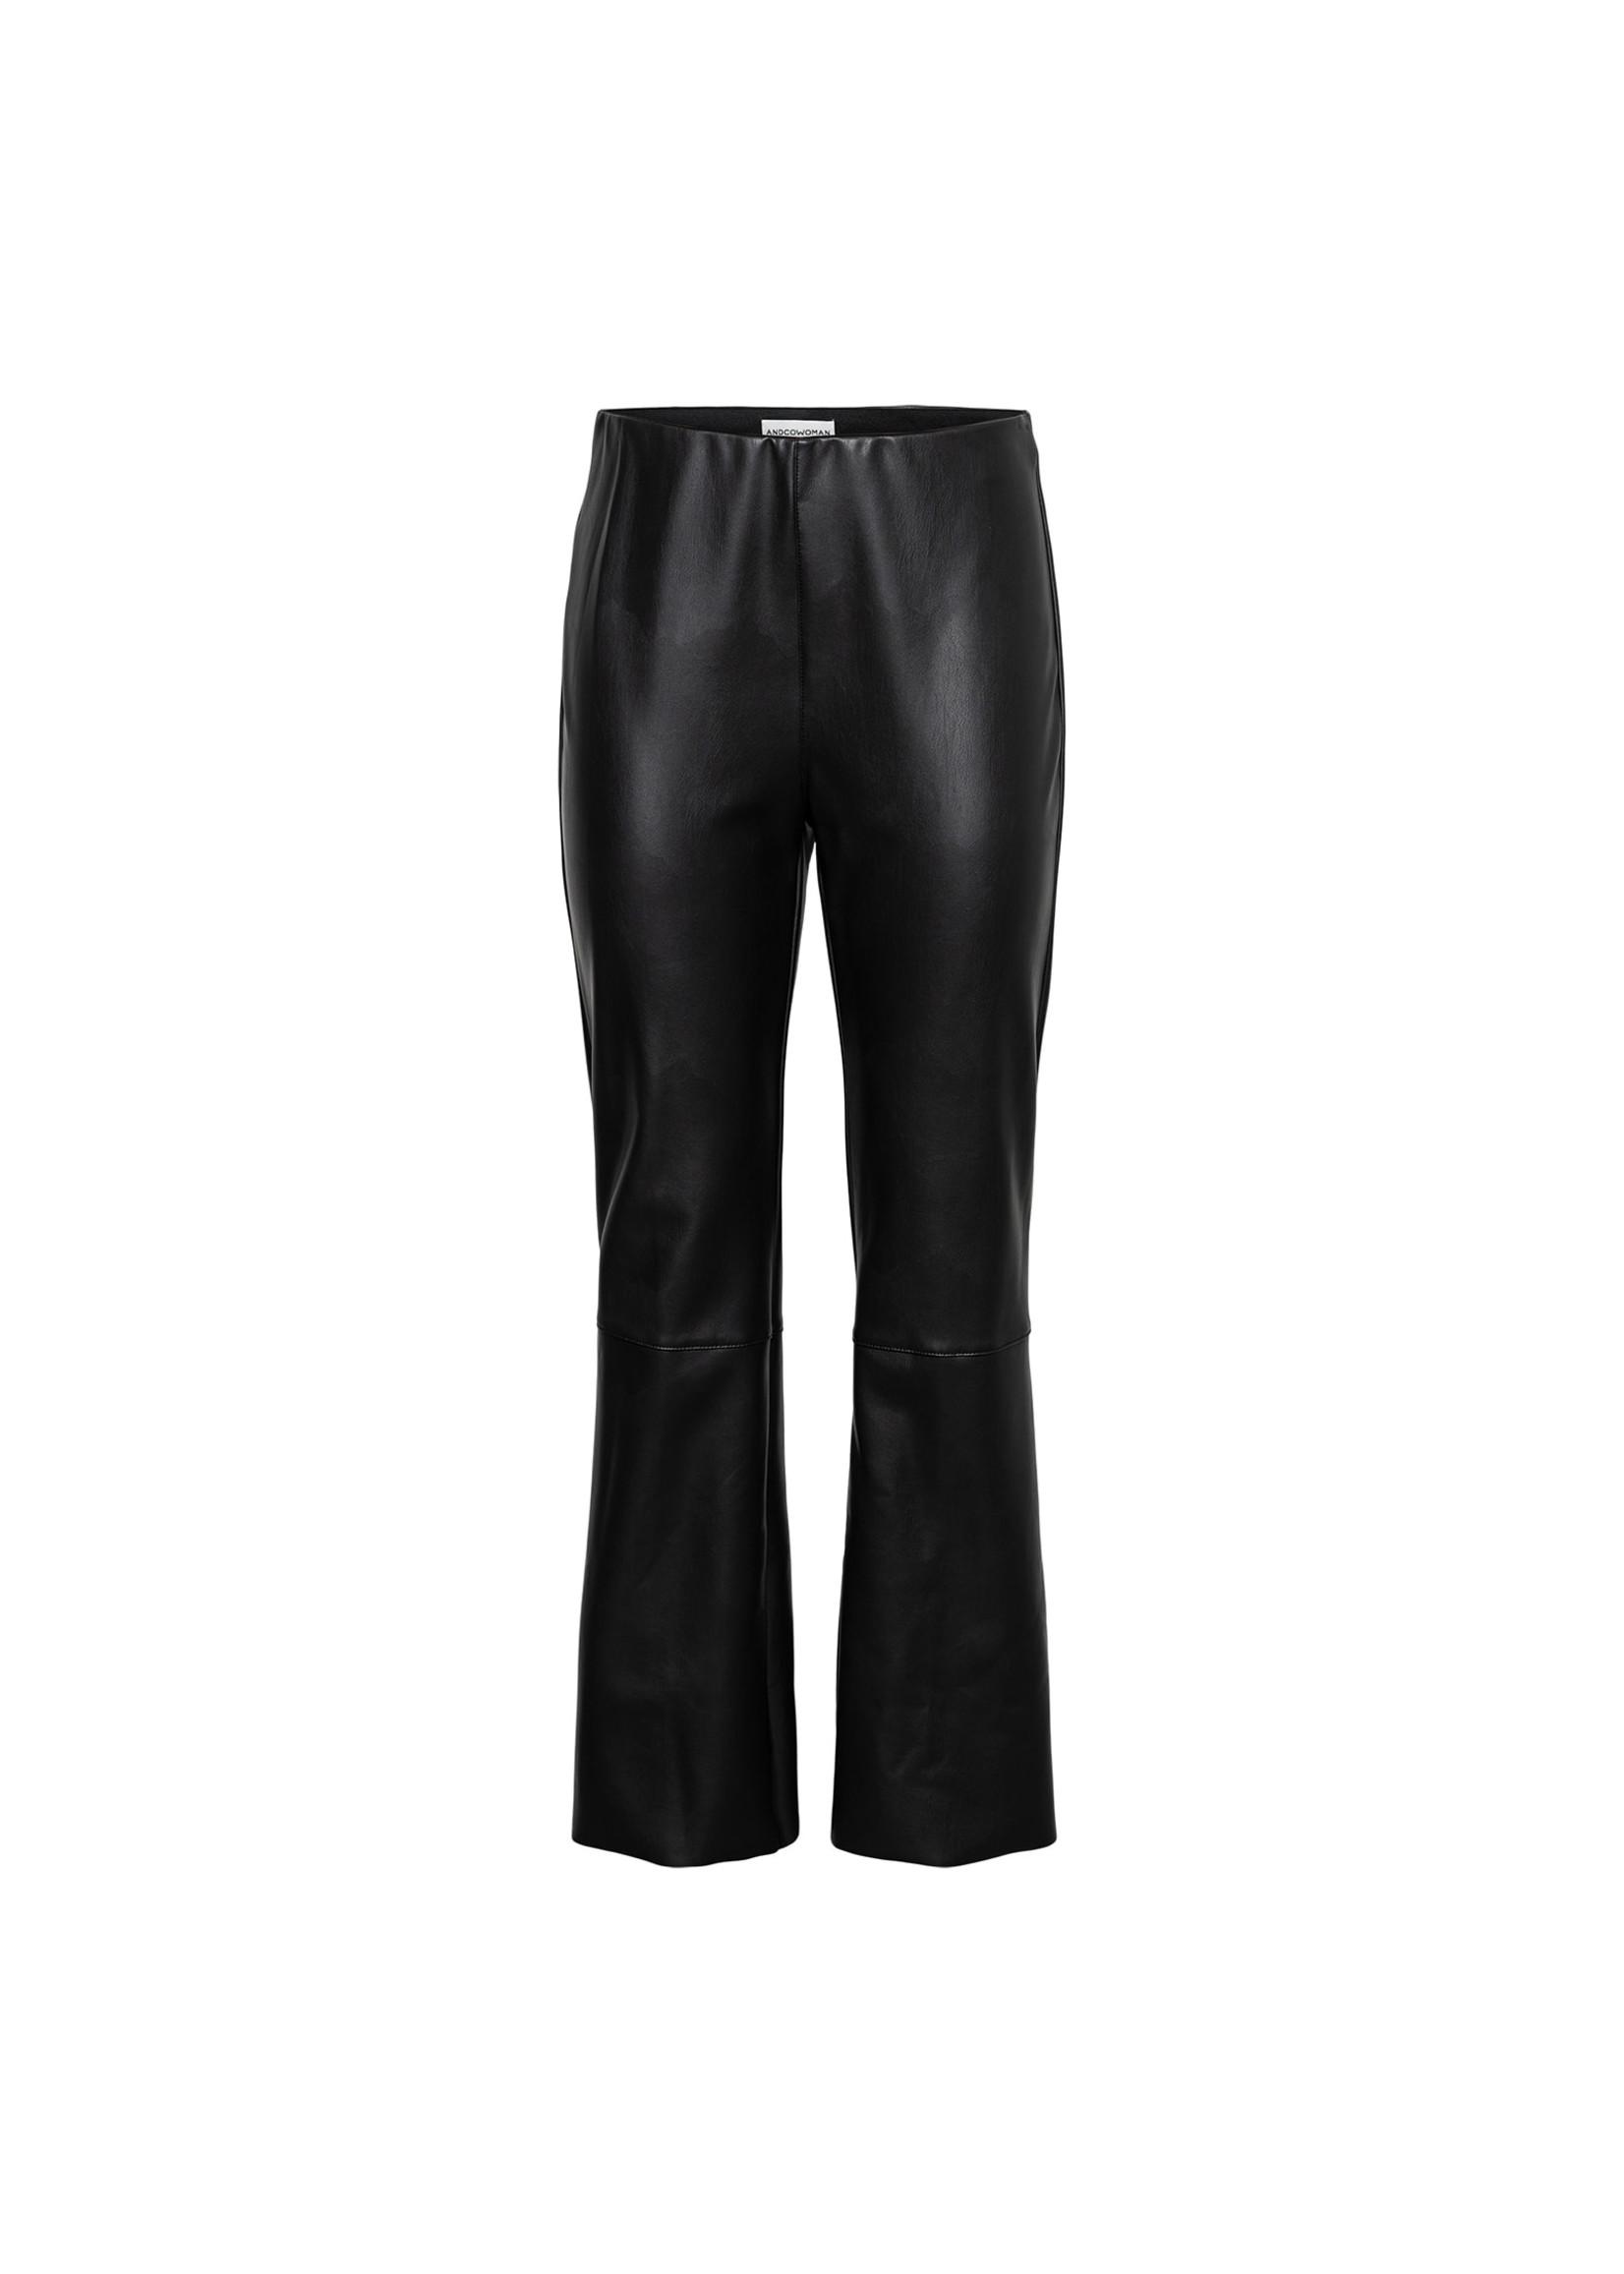 &Co Women Harley pu pants